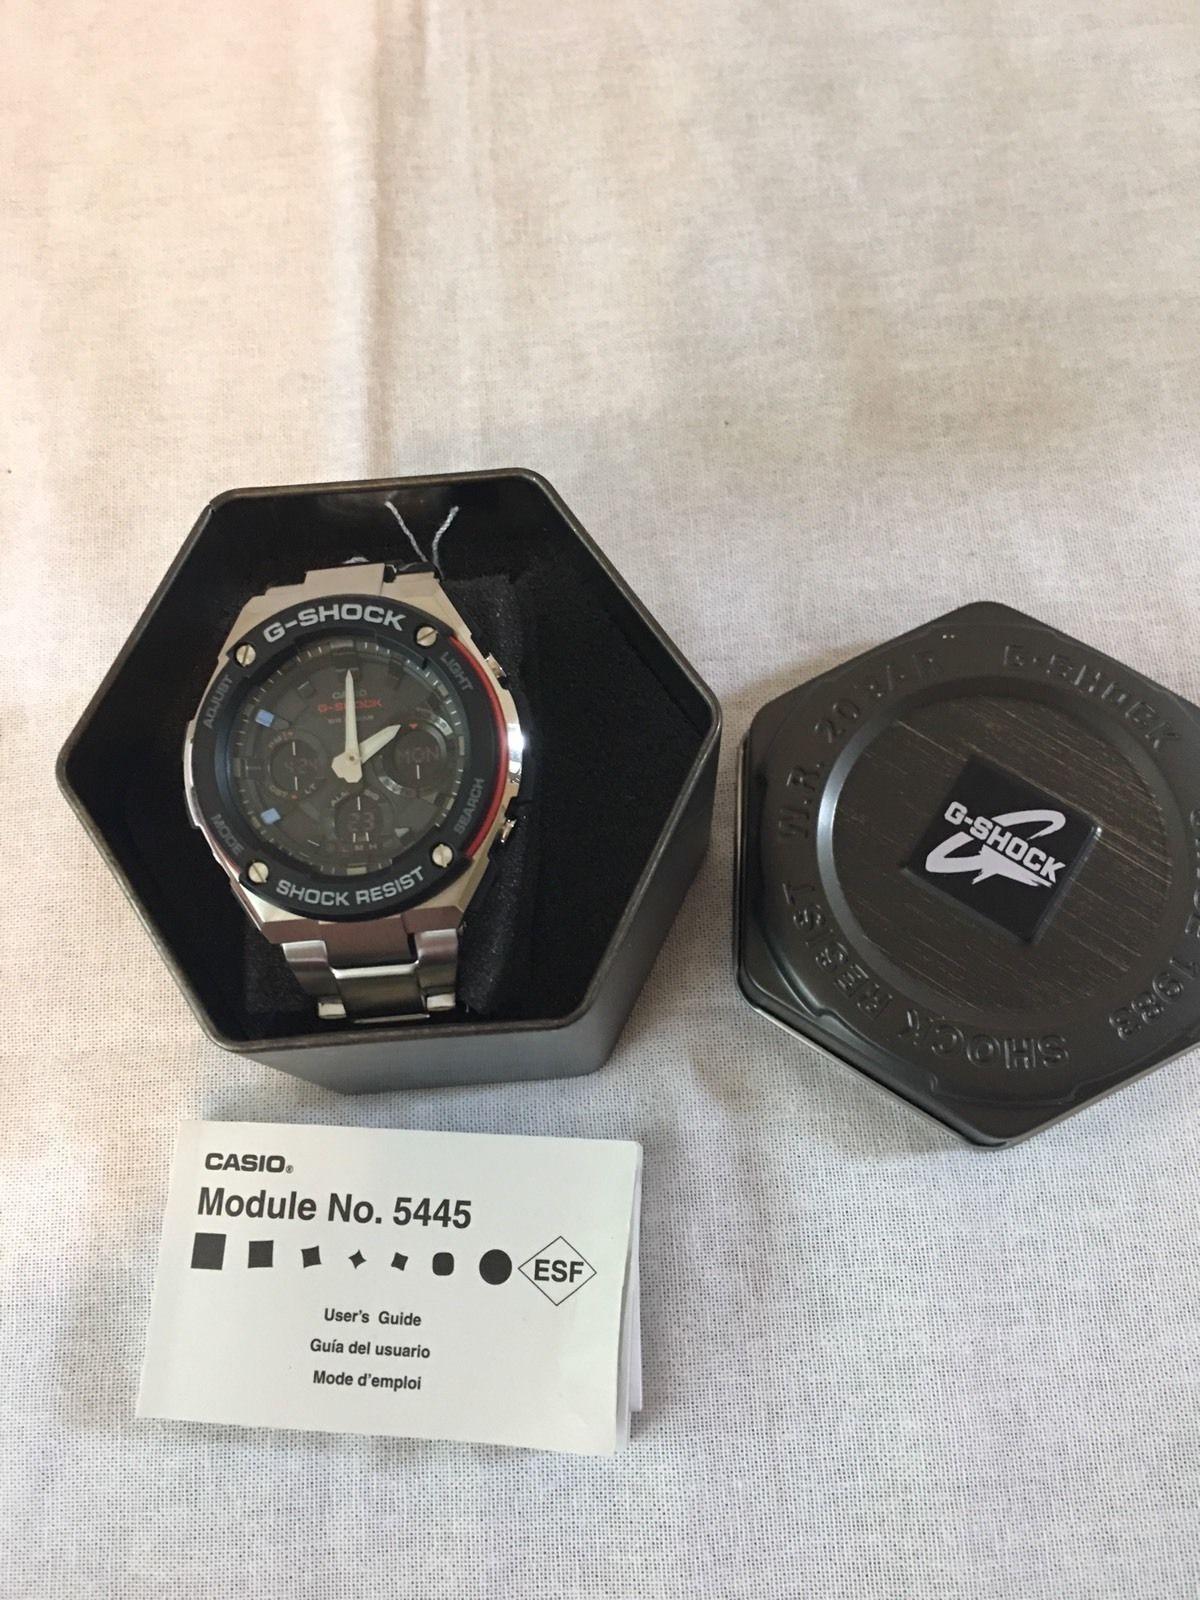 2e0f6e455c0f NWT Casio G-Shock G-Steel Solar Power Ana-Digi Watch GSTS100D-1A4 ...